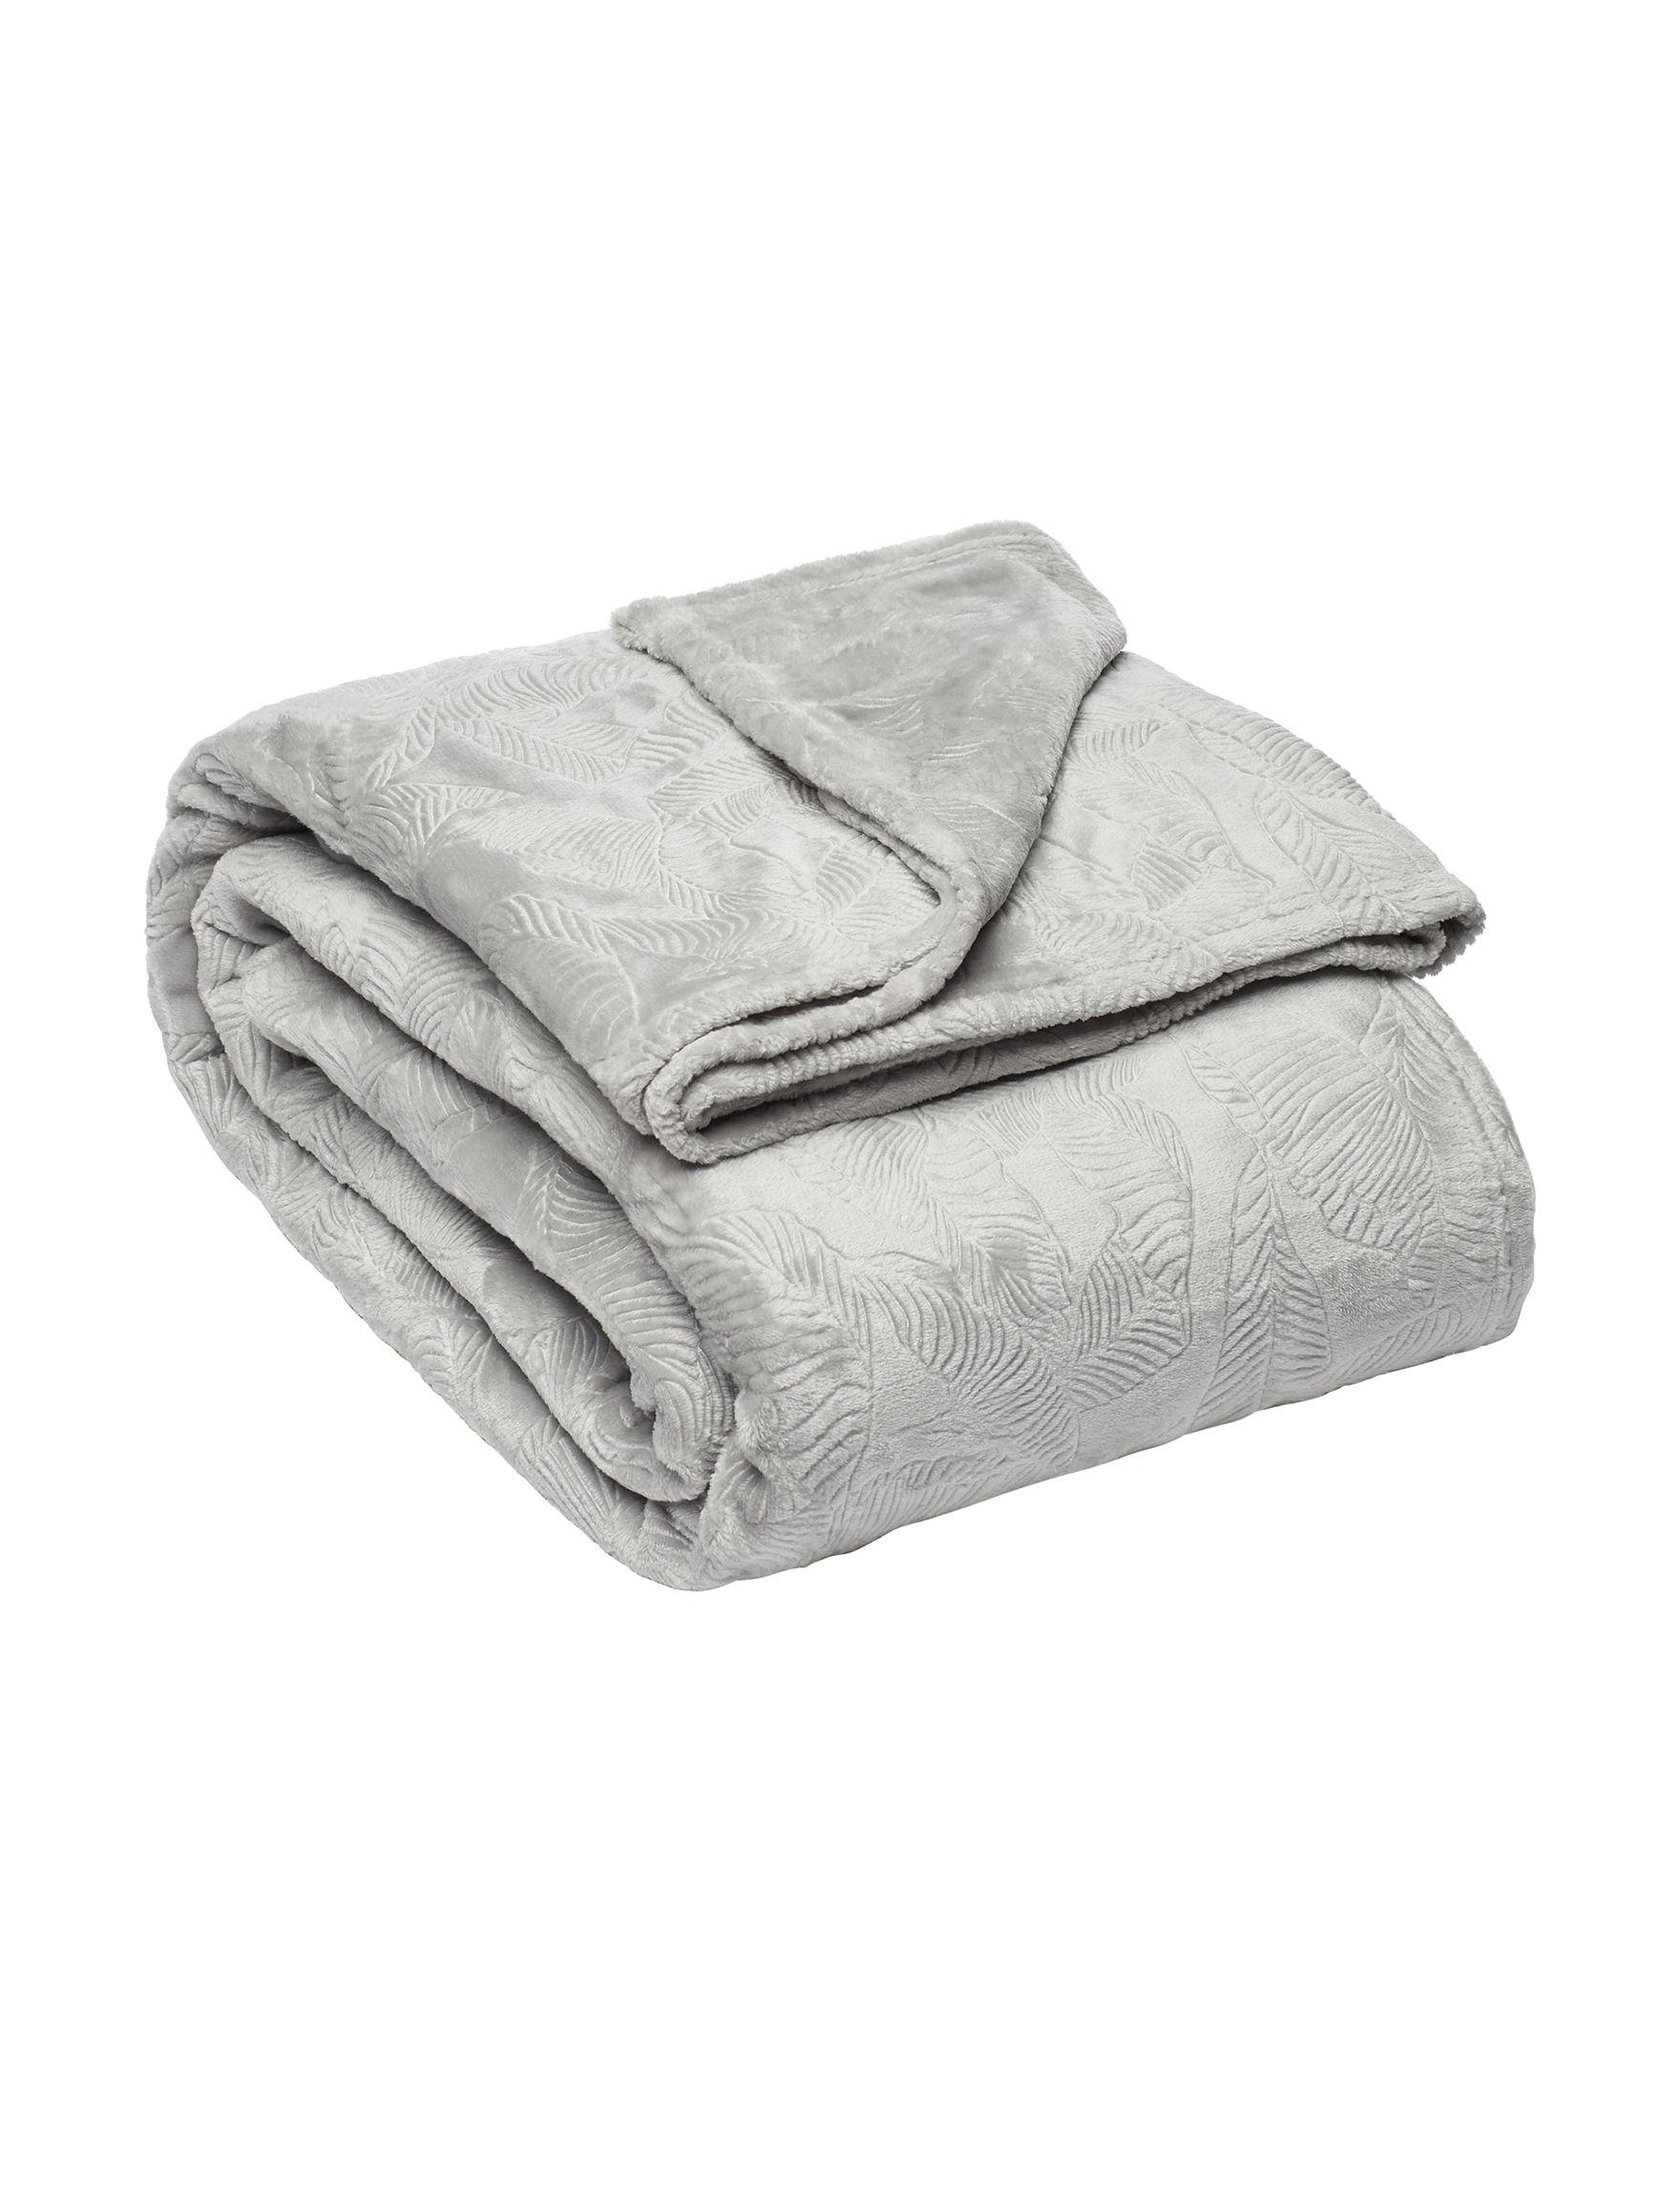 Elle Silver Blankets & Throws